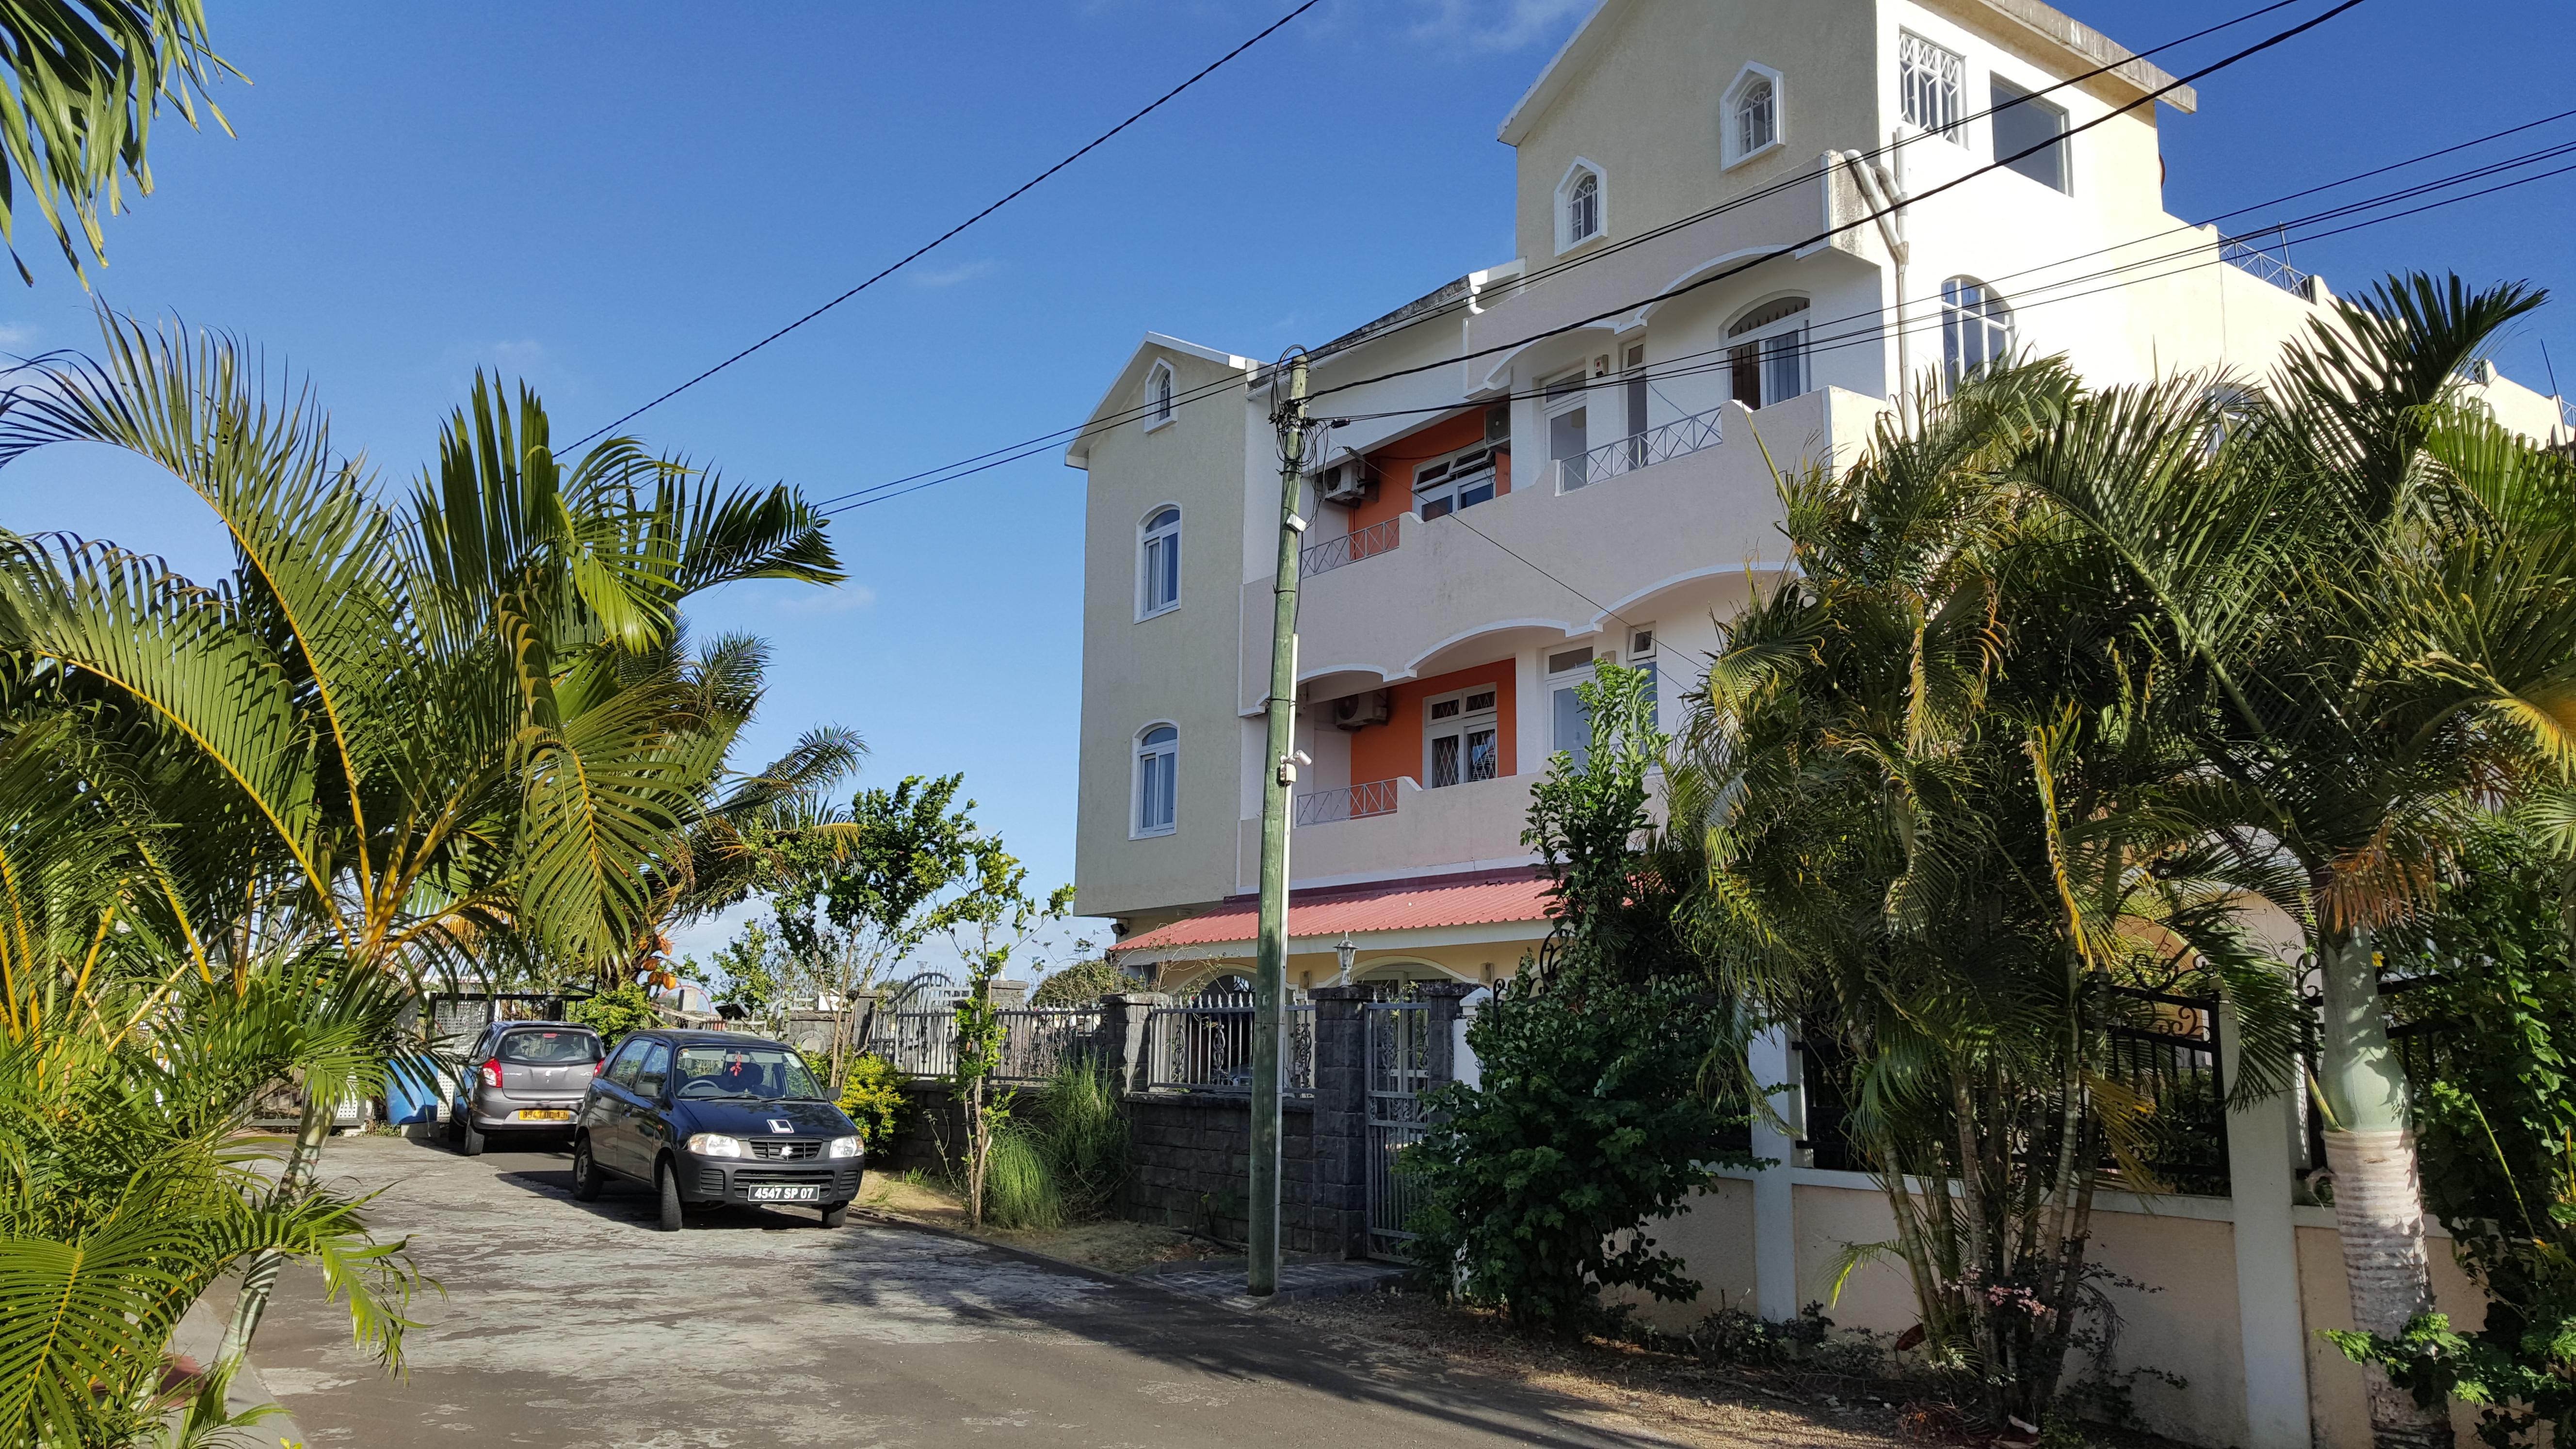 Trou-aux-Biches, Mieten Mauritius Selbstverpflegung Wohnung 200 m zu Trou aux Biches beach.Free 24/7 wifi